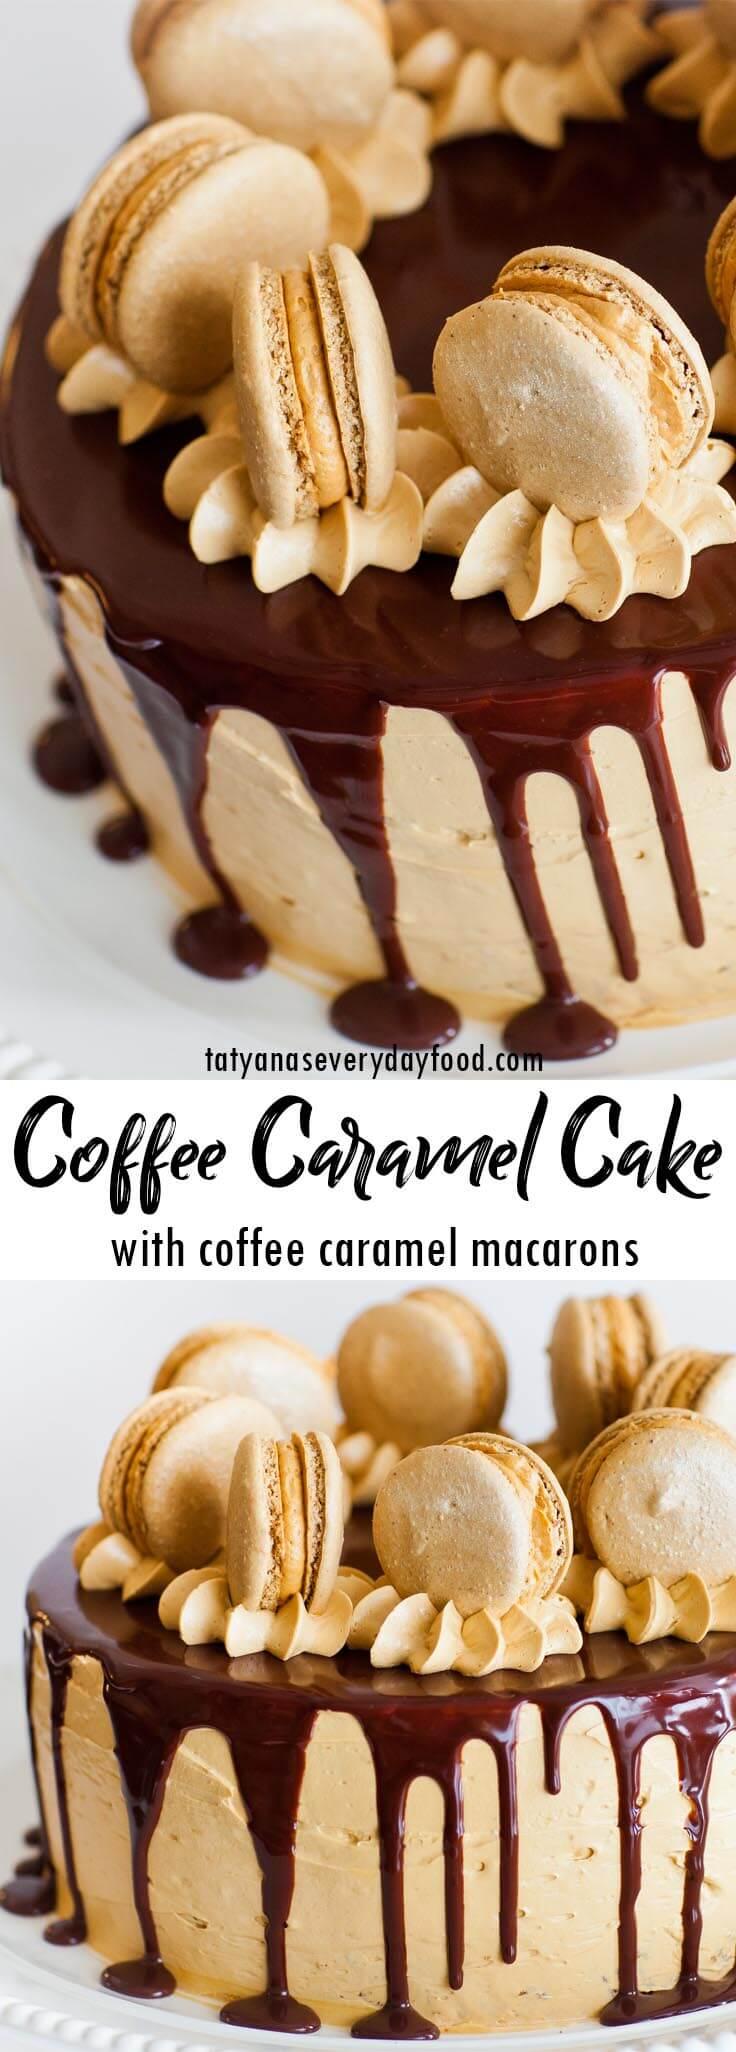 Coffee Caramel Cake video recipe